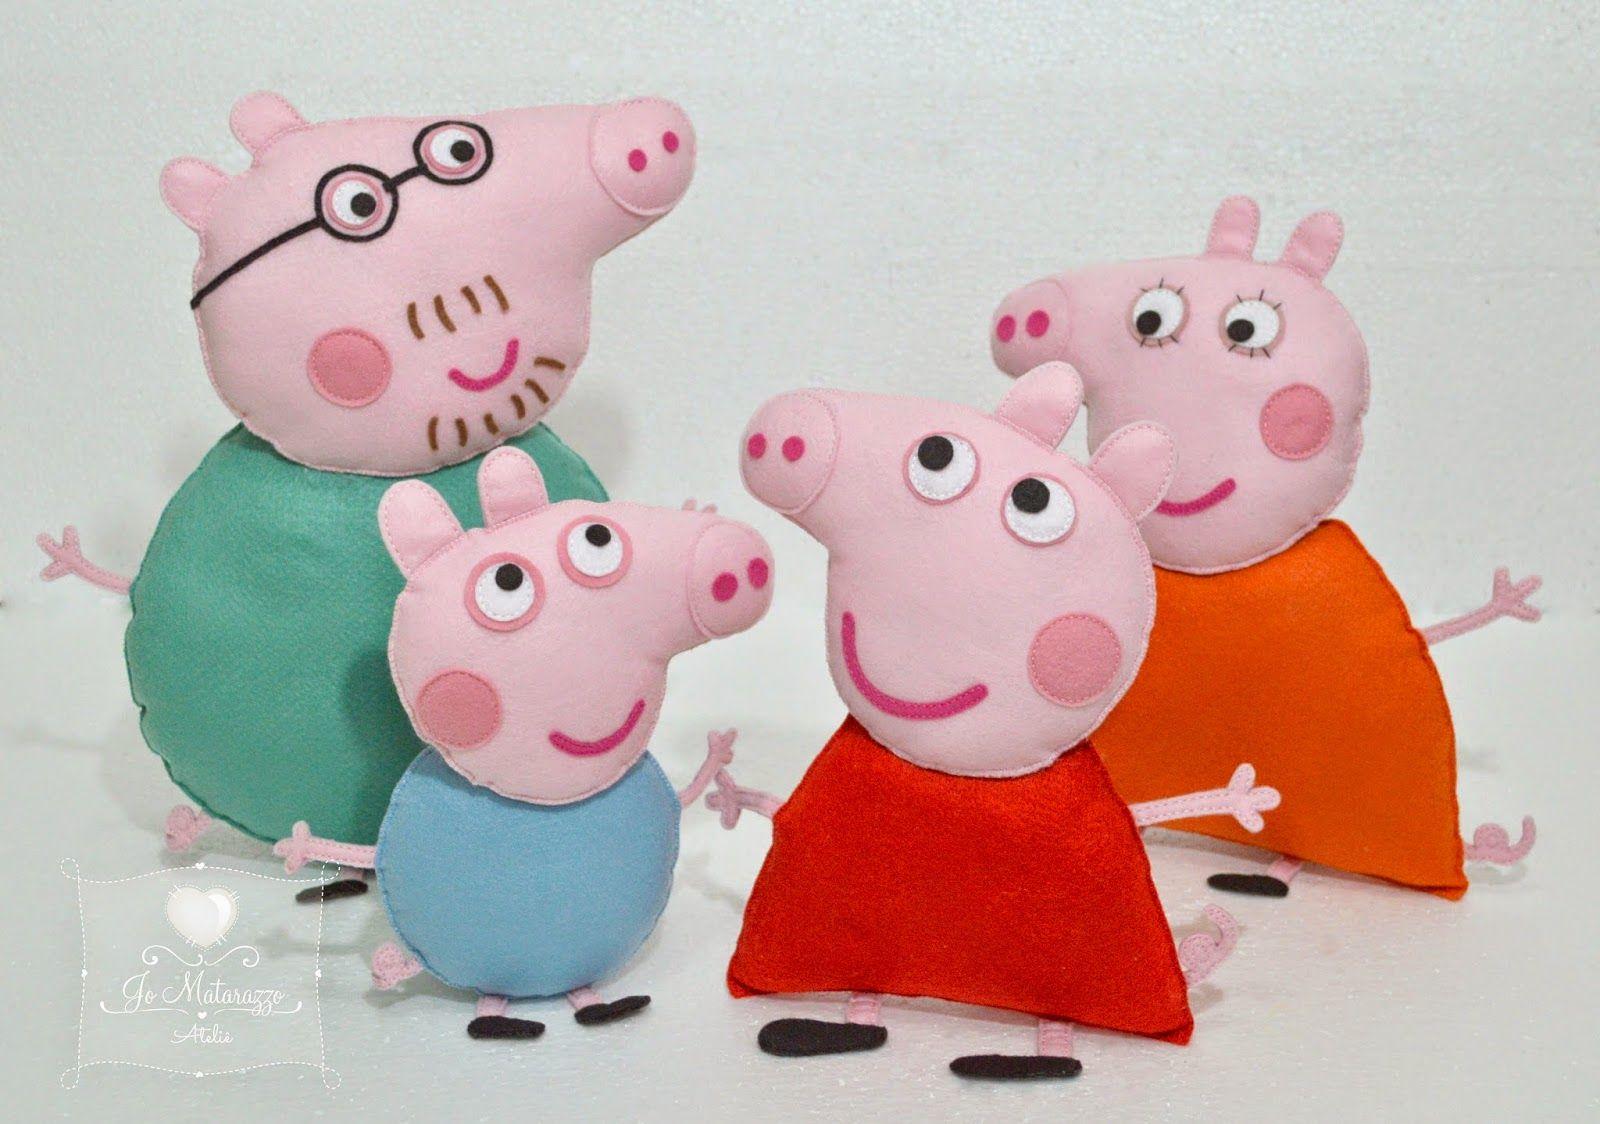 Peppa5 Jpg 1600 1124 Familia Peppa Pig Gatinho De Feltro